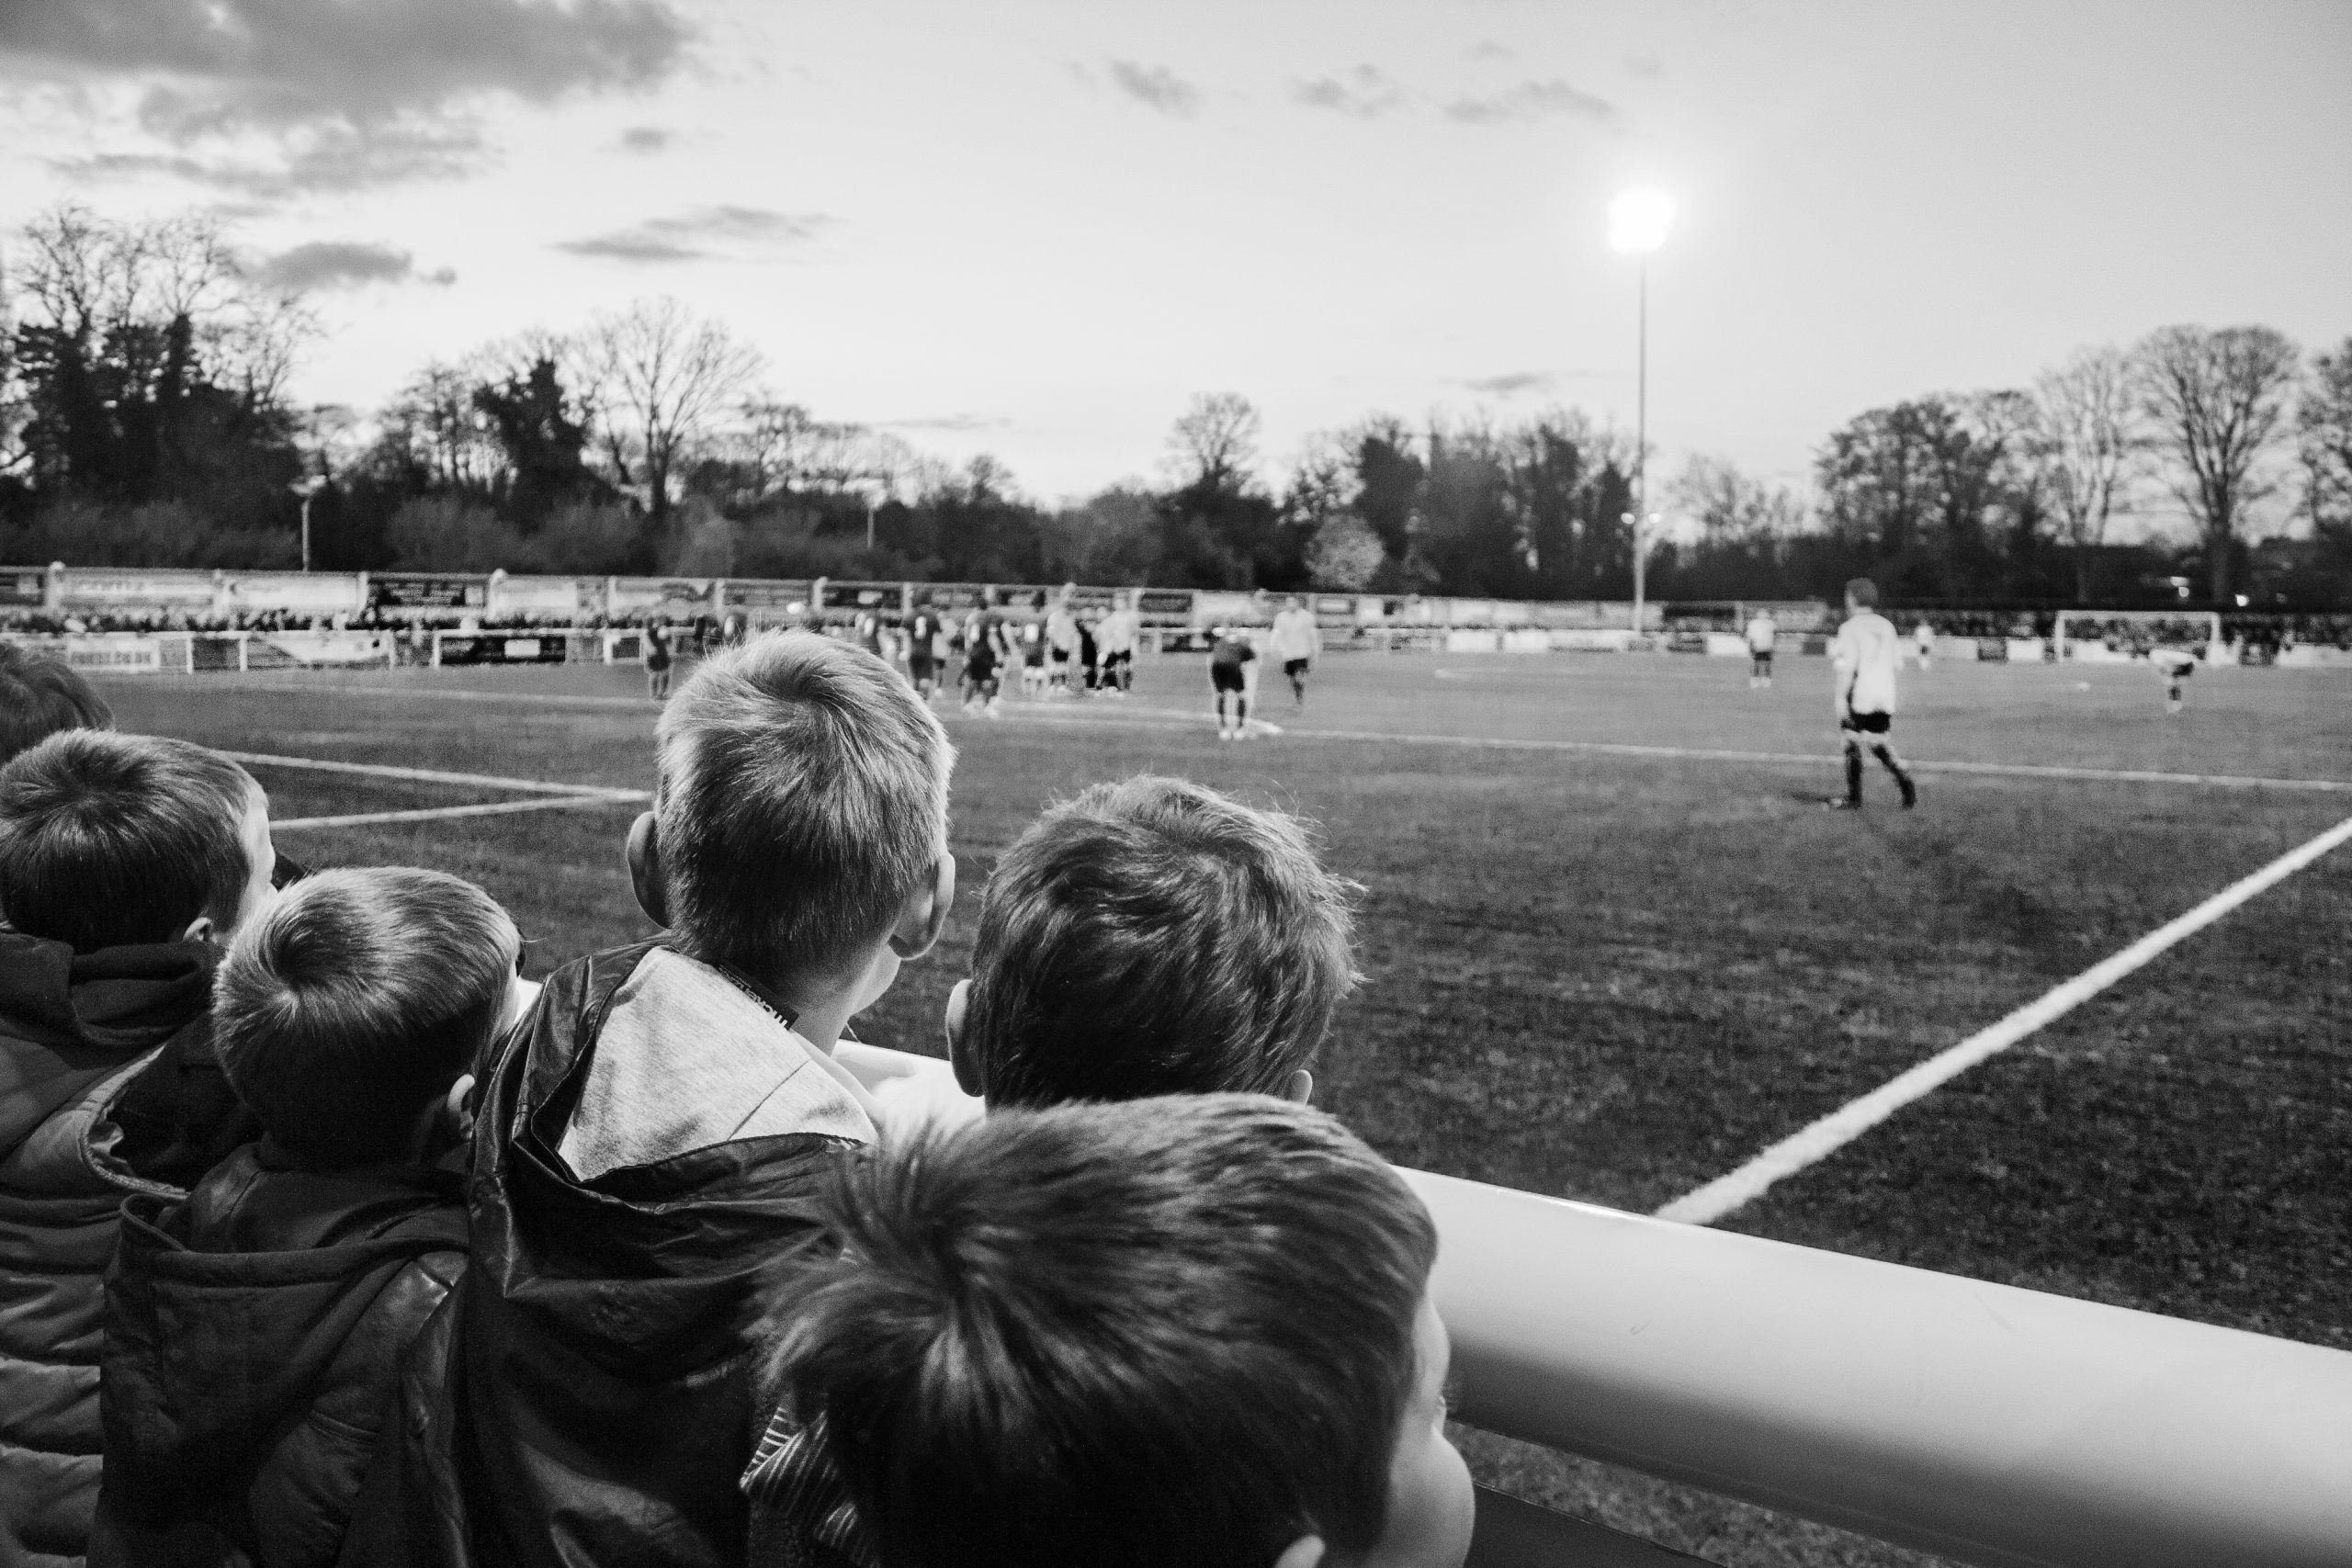 Inspired little boys watching football